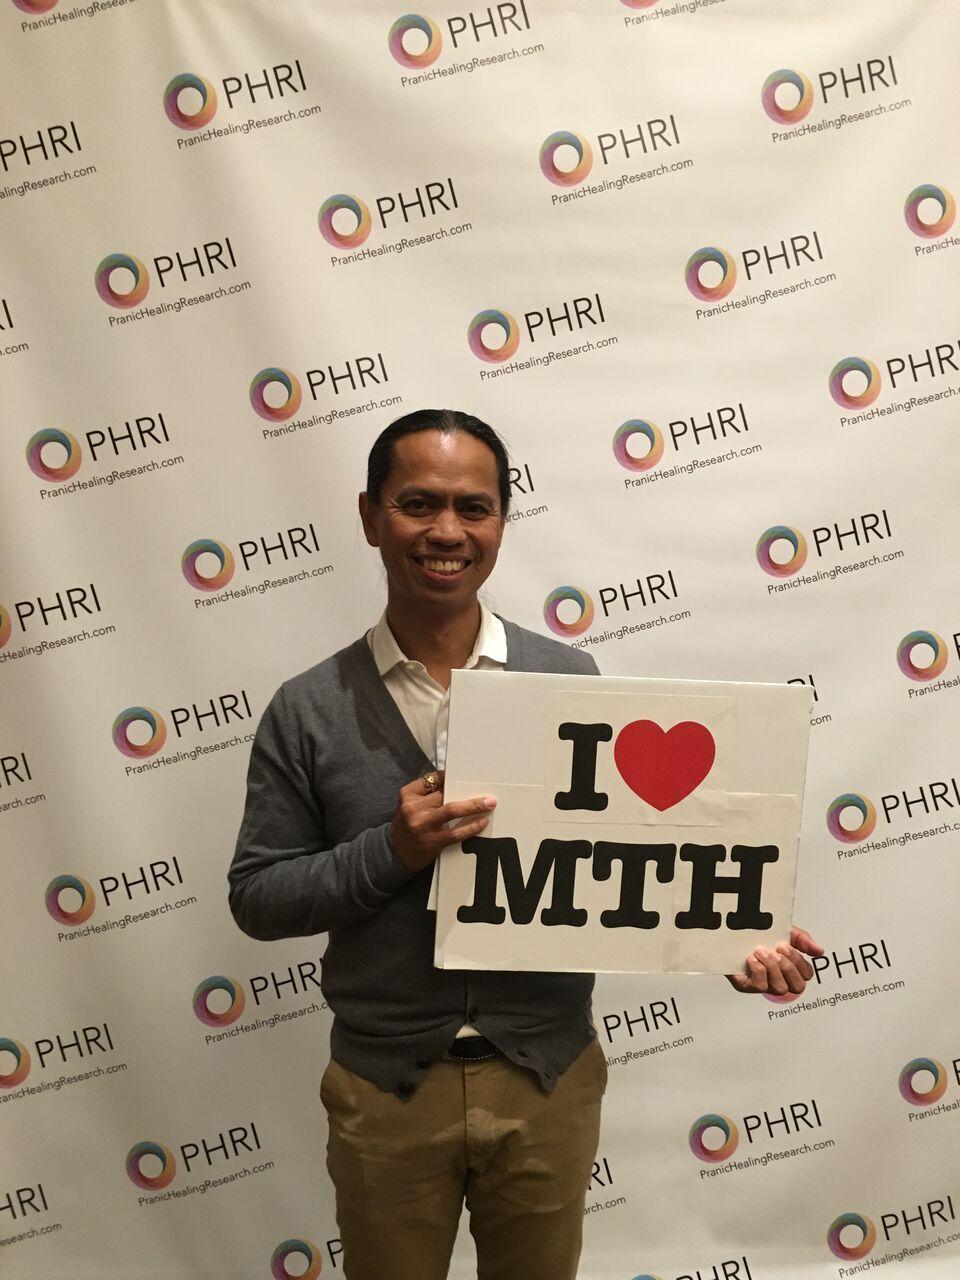 Pic_PHRI_MH.jpg